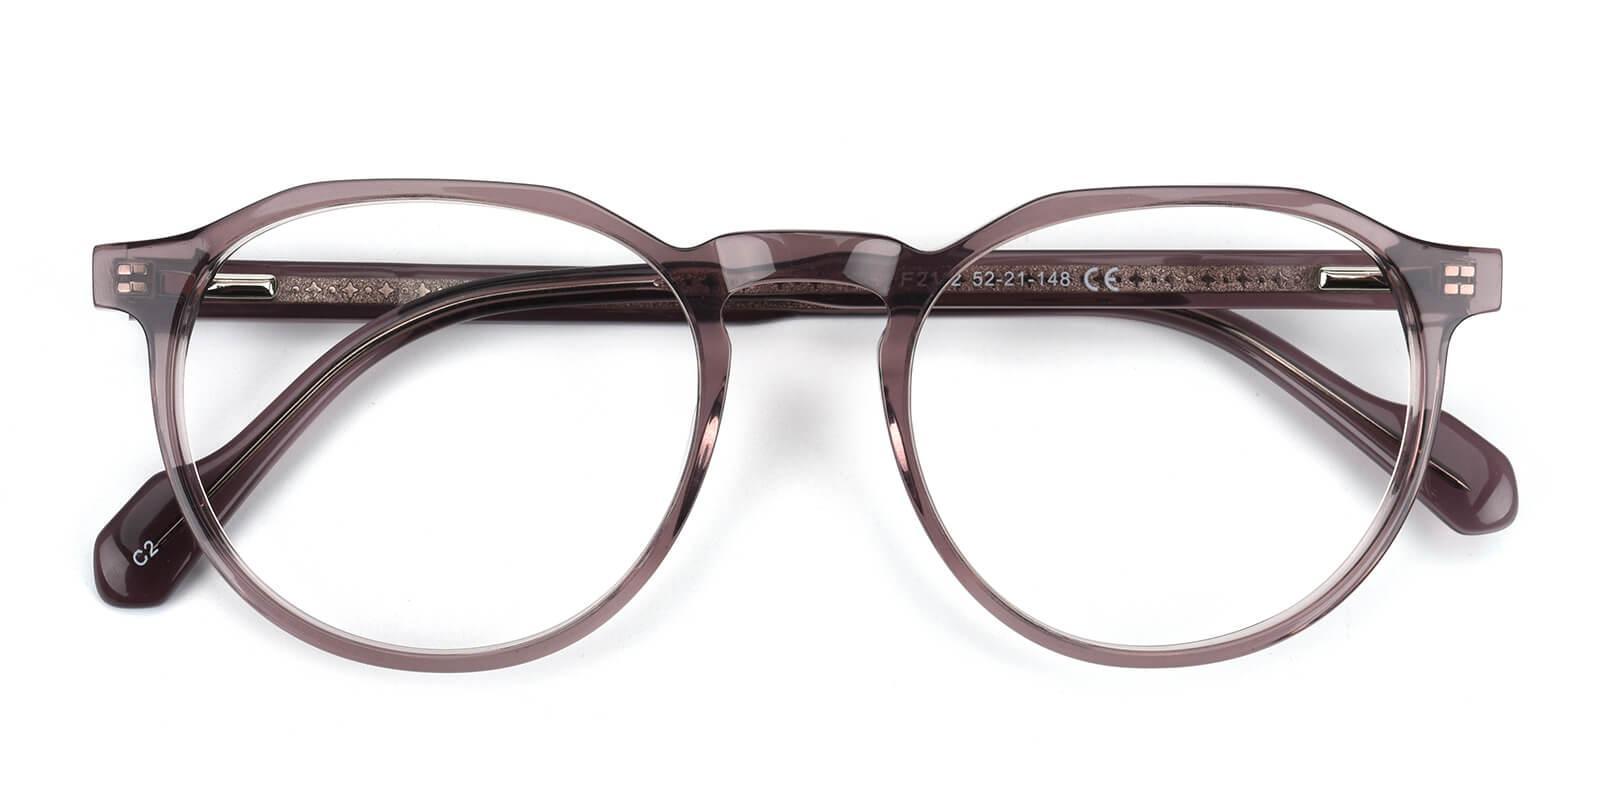 Merimis-Purple-Round-Acetate-Eyeglasses-detail